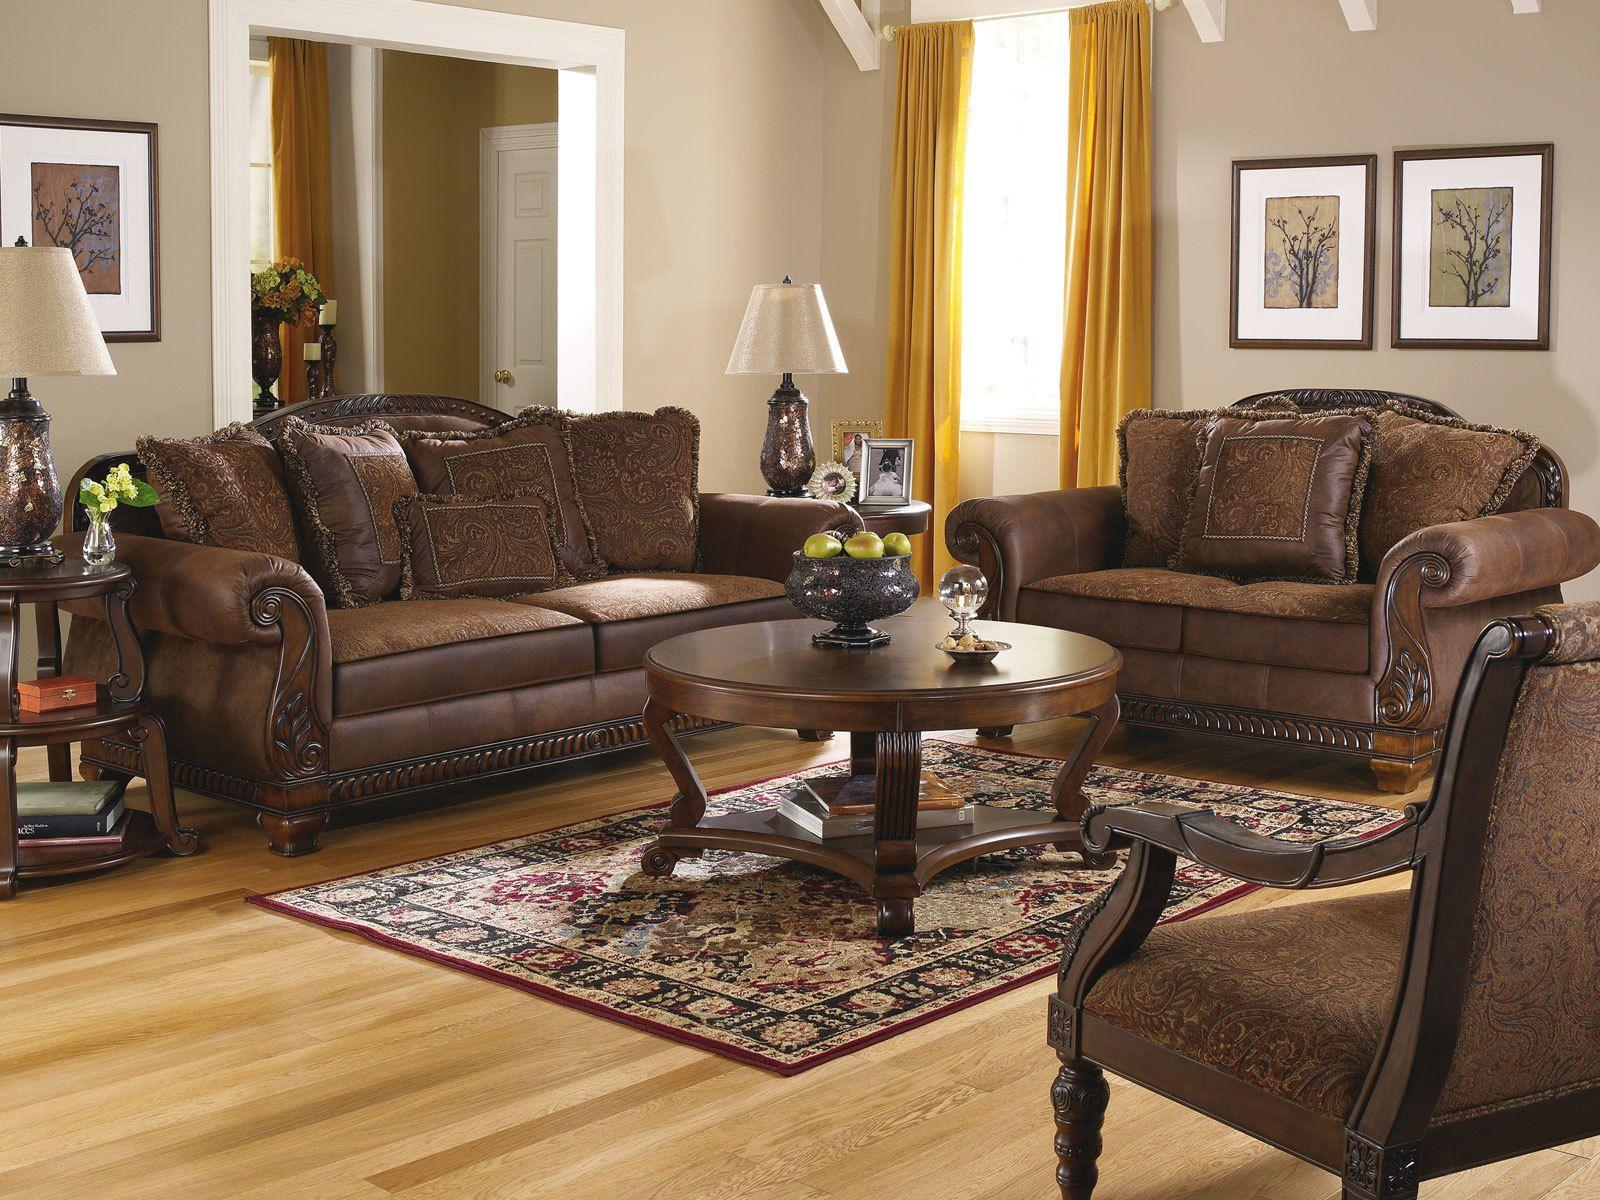 Brady traditional wood trim chenille fabric sofa set living room furniture ebay